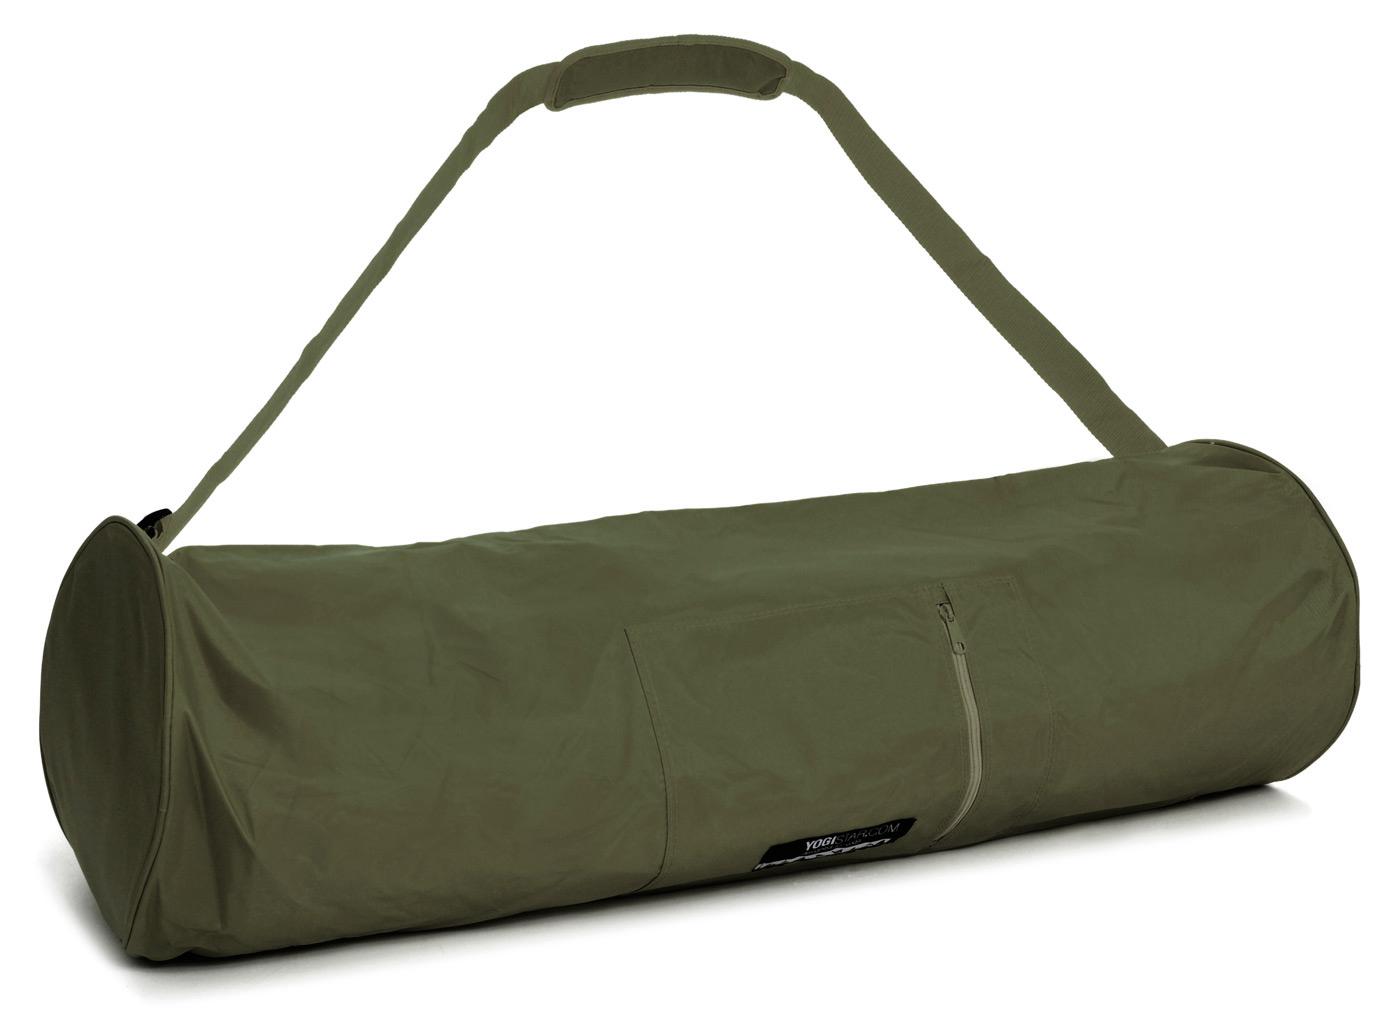 Yogatasche basic - zip - extra big - nylon - 80 cm